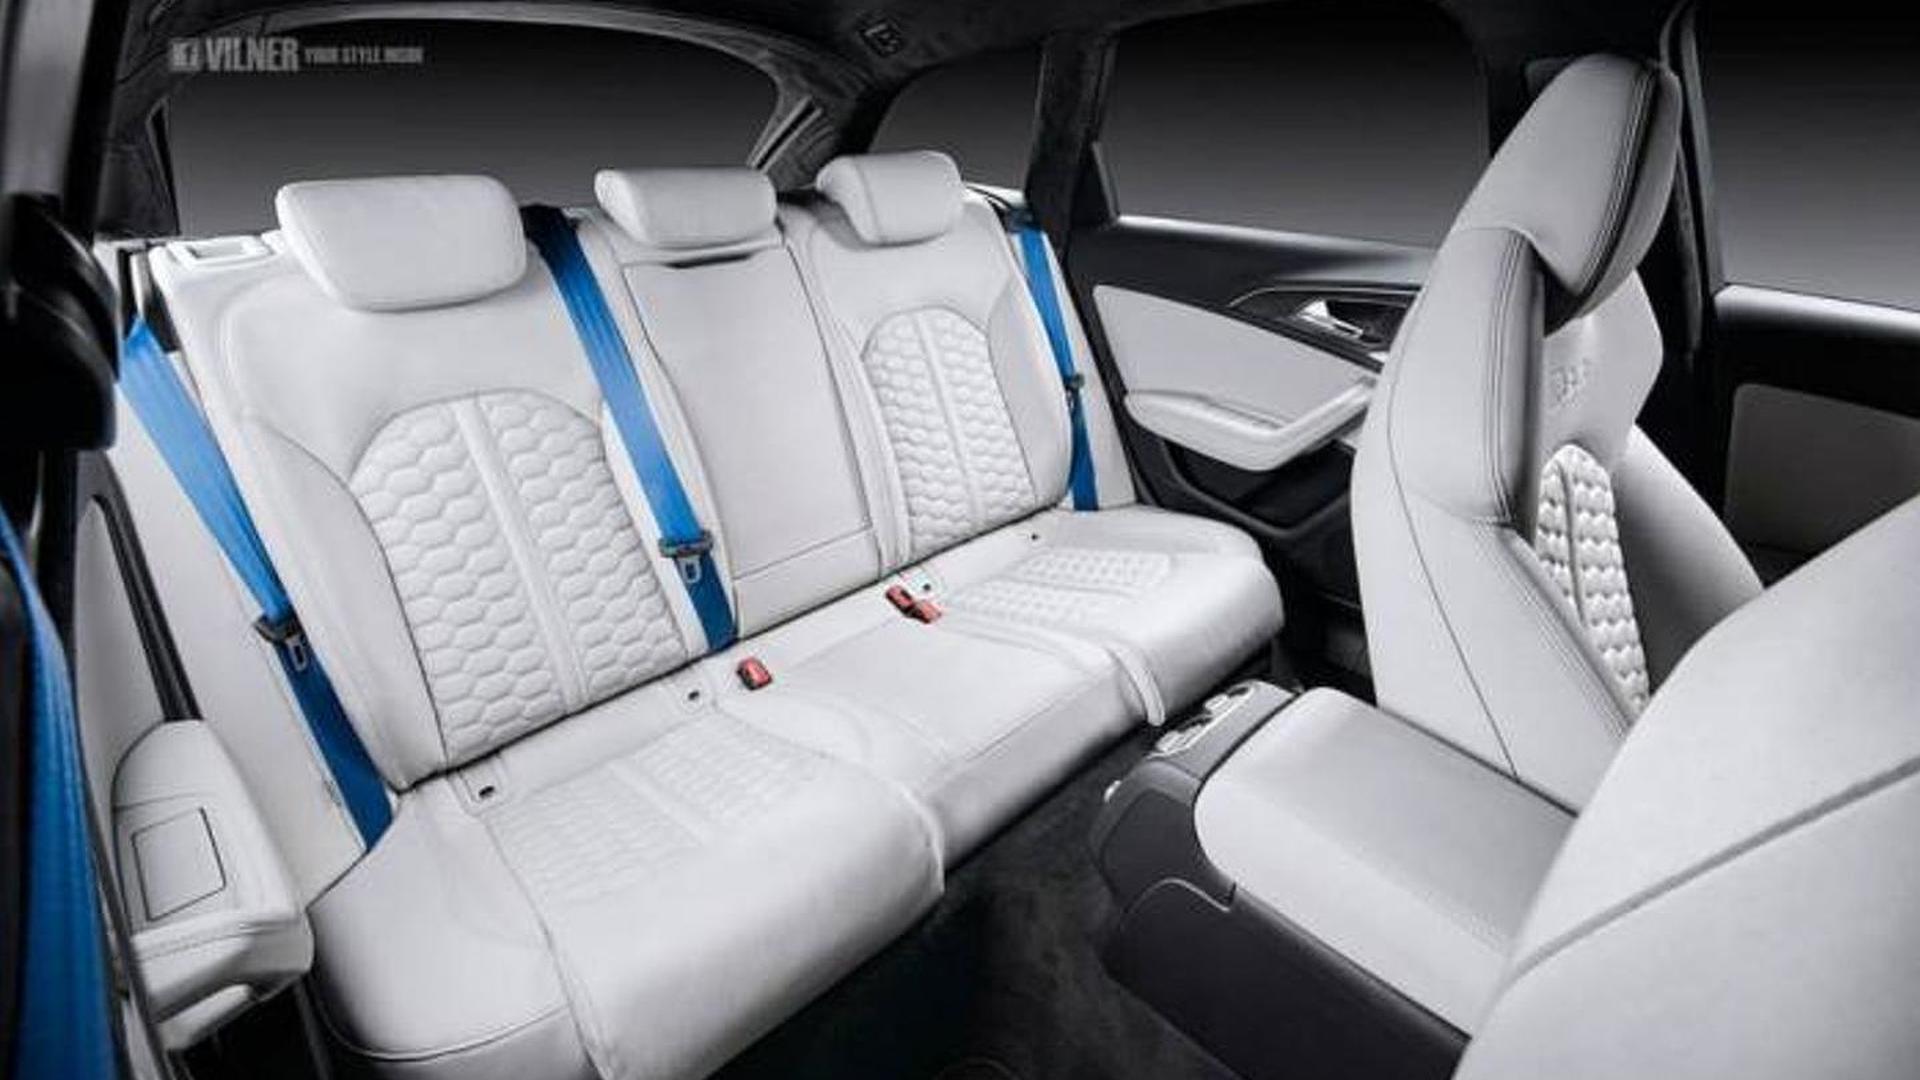 Обивка салона нубуком Audi RS6 Avant от Vilner